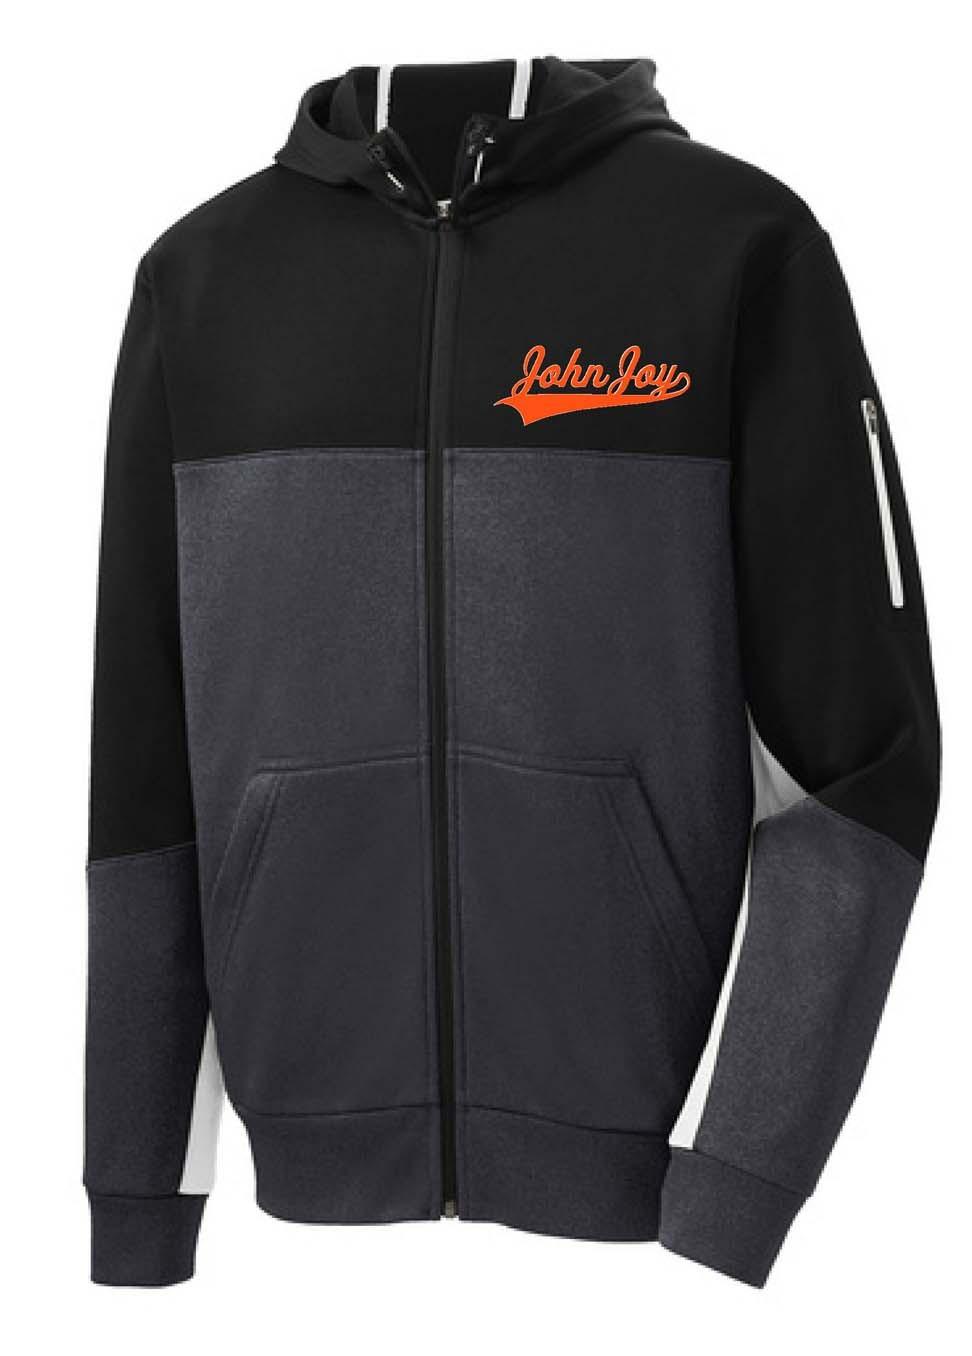 John Joy Swoosh Men's Sport-Tek Colorblock Full Zip Hooded Jacket